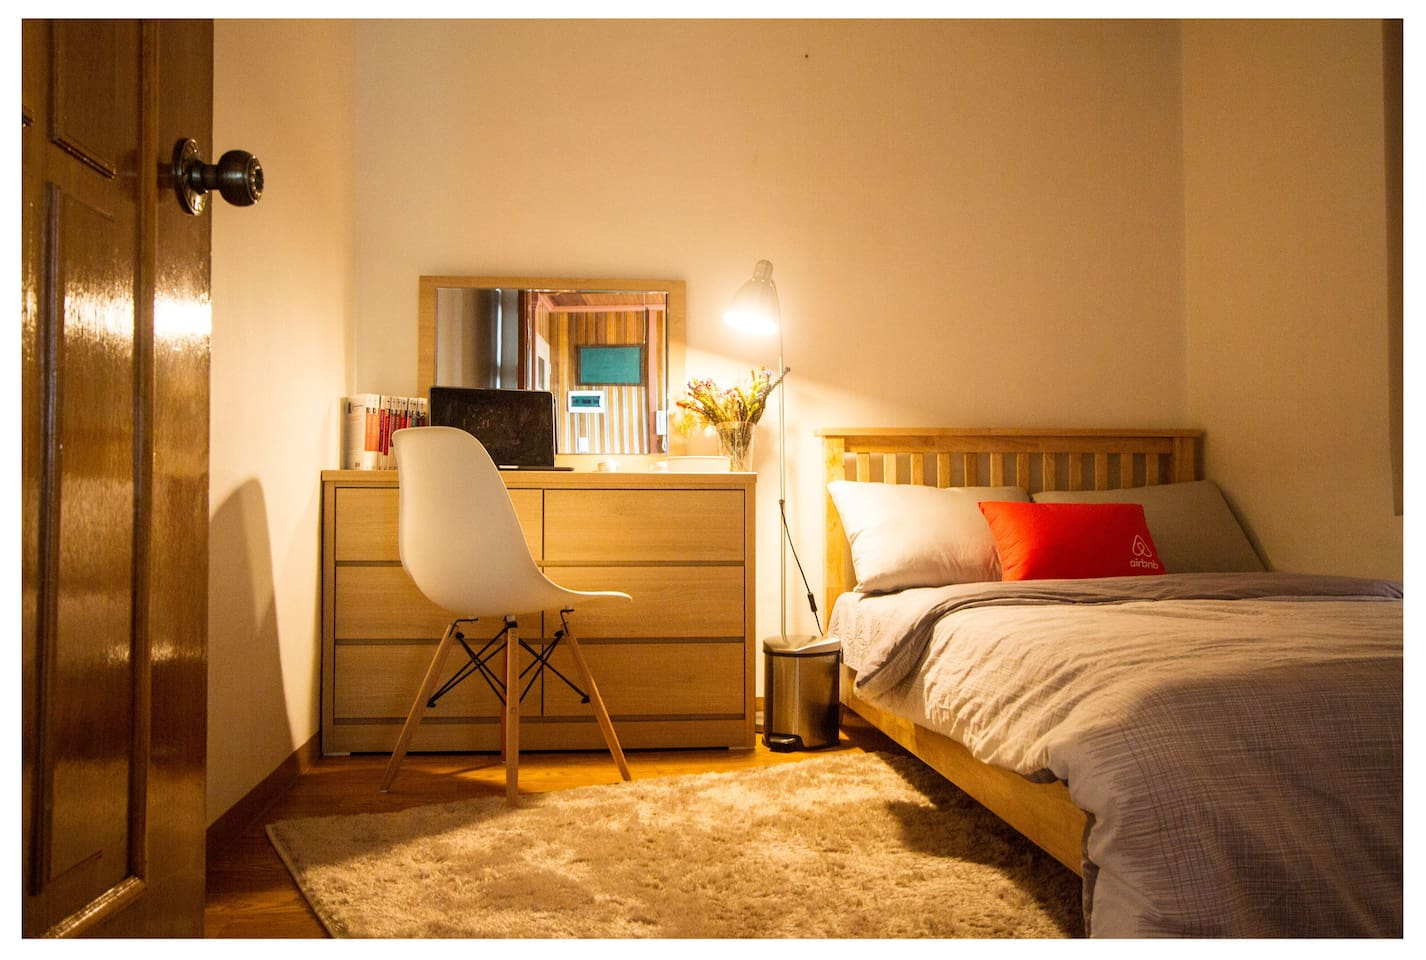 Newly arranged room!